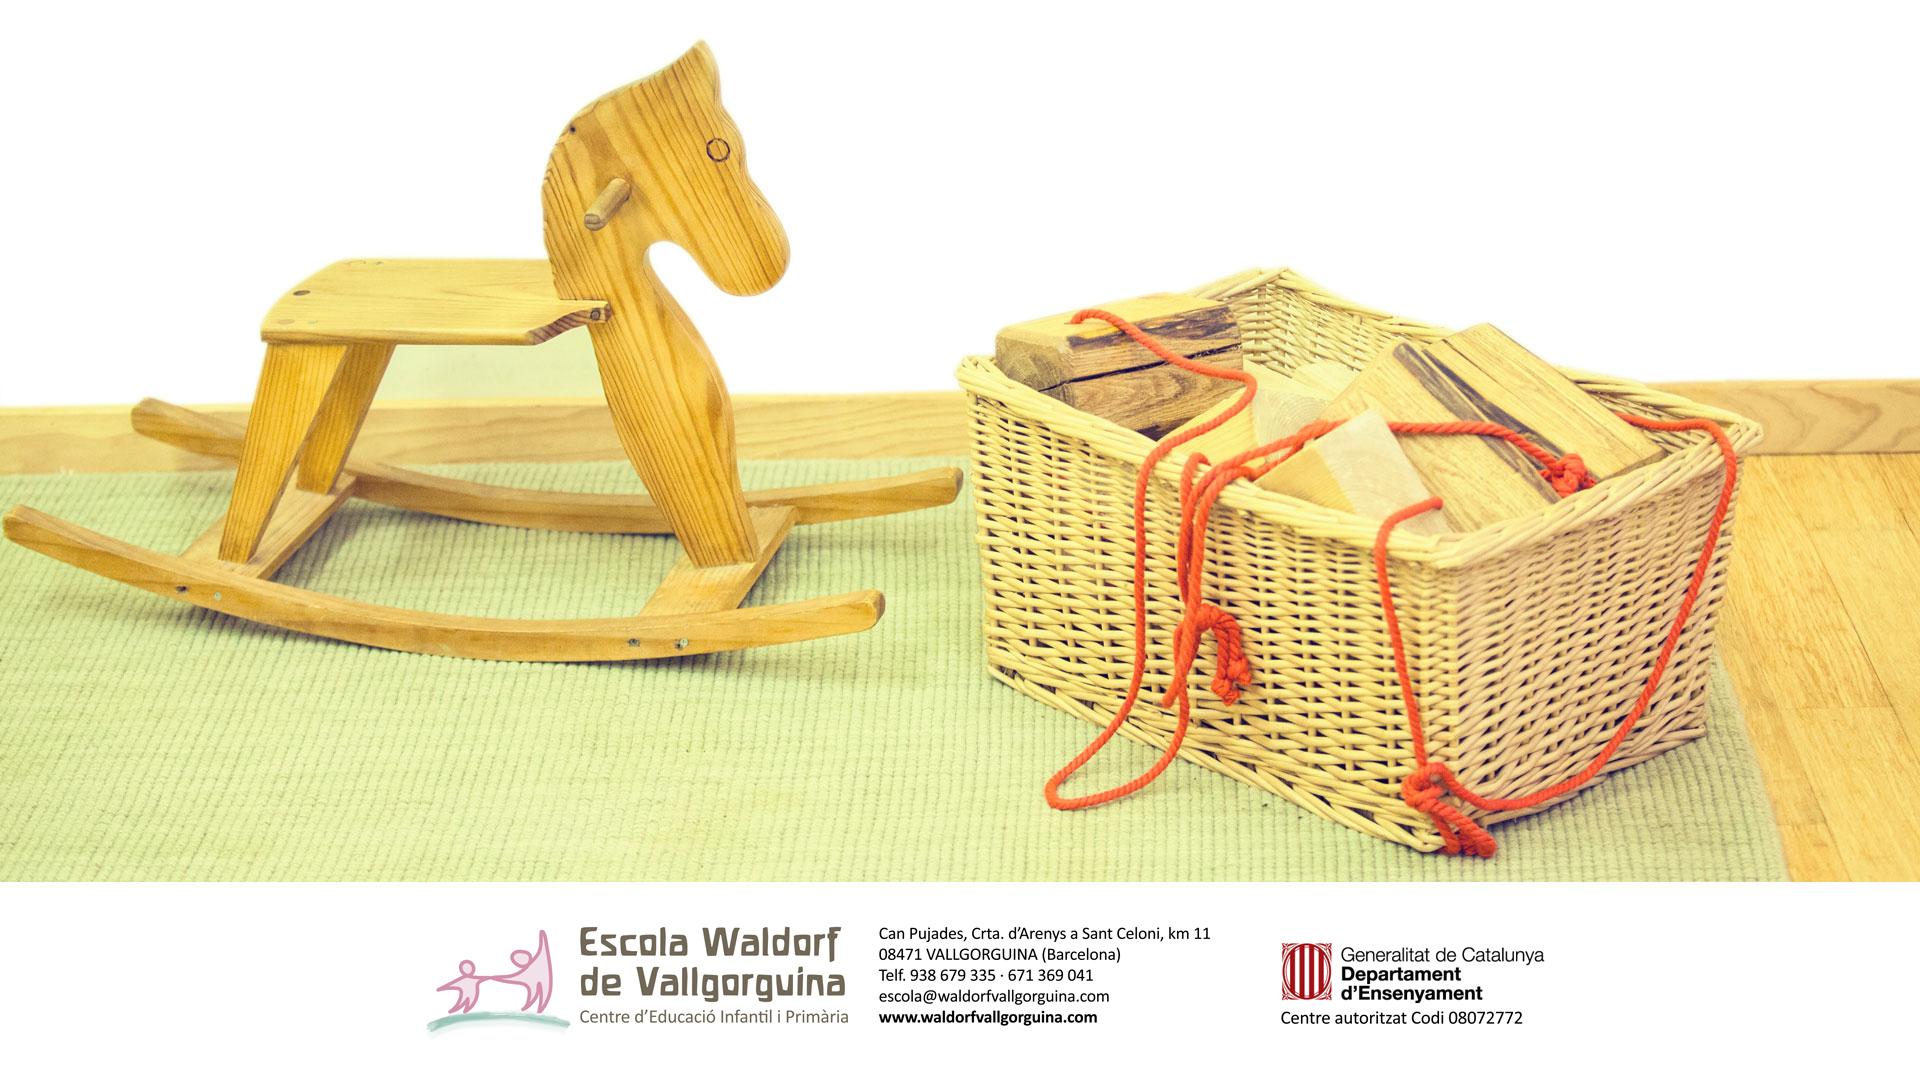 Waldorf Vallgorguina